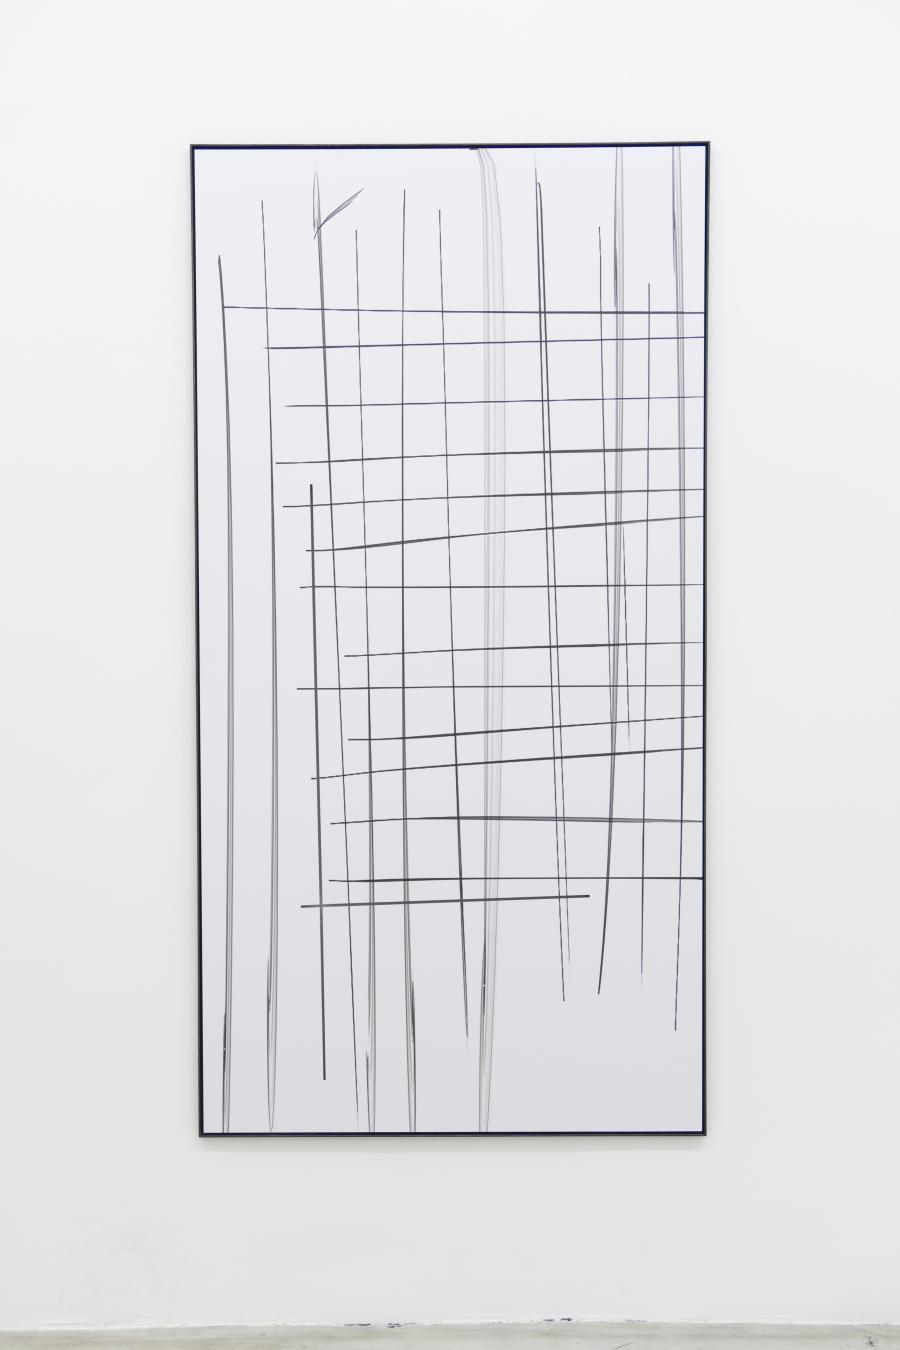 Marina Sula, Drawing - phone, tablet drawing, UV-print on Dibond, laser cut, steel, 172 x 89 cm, 2015